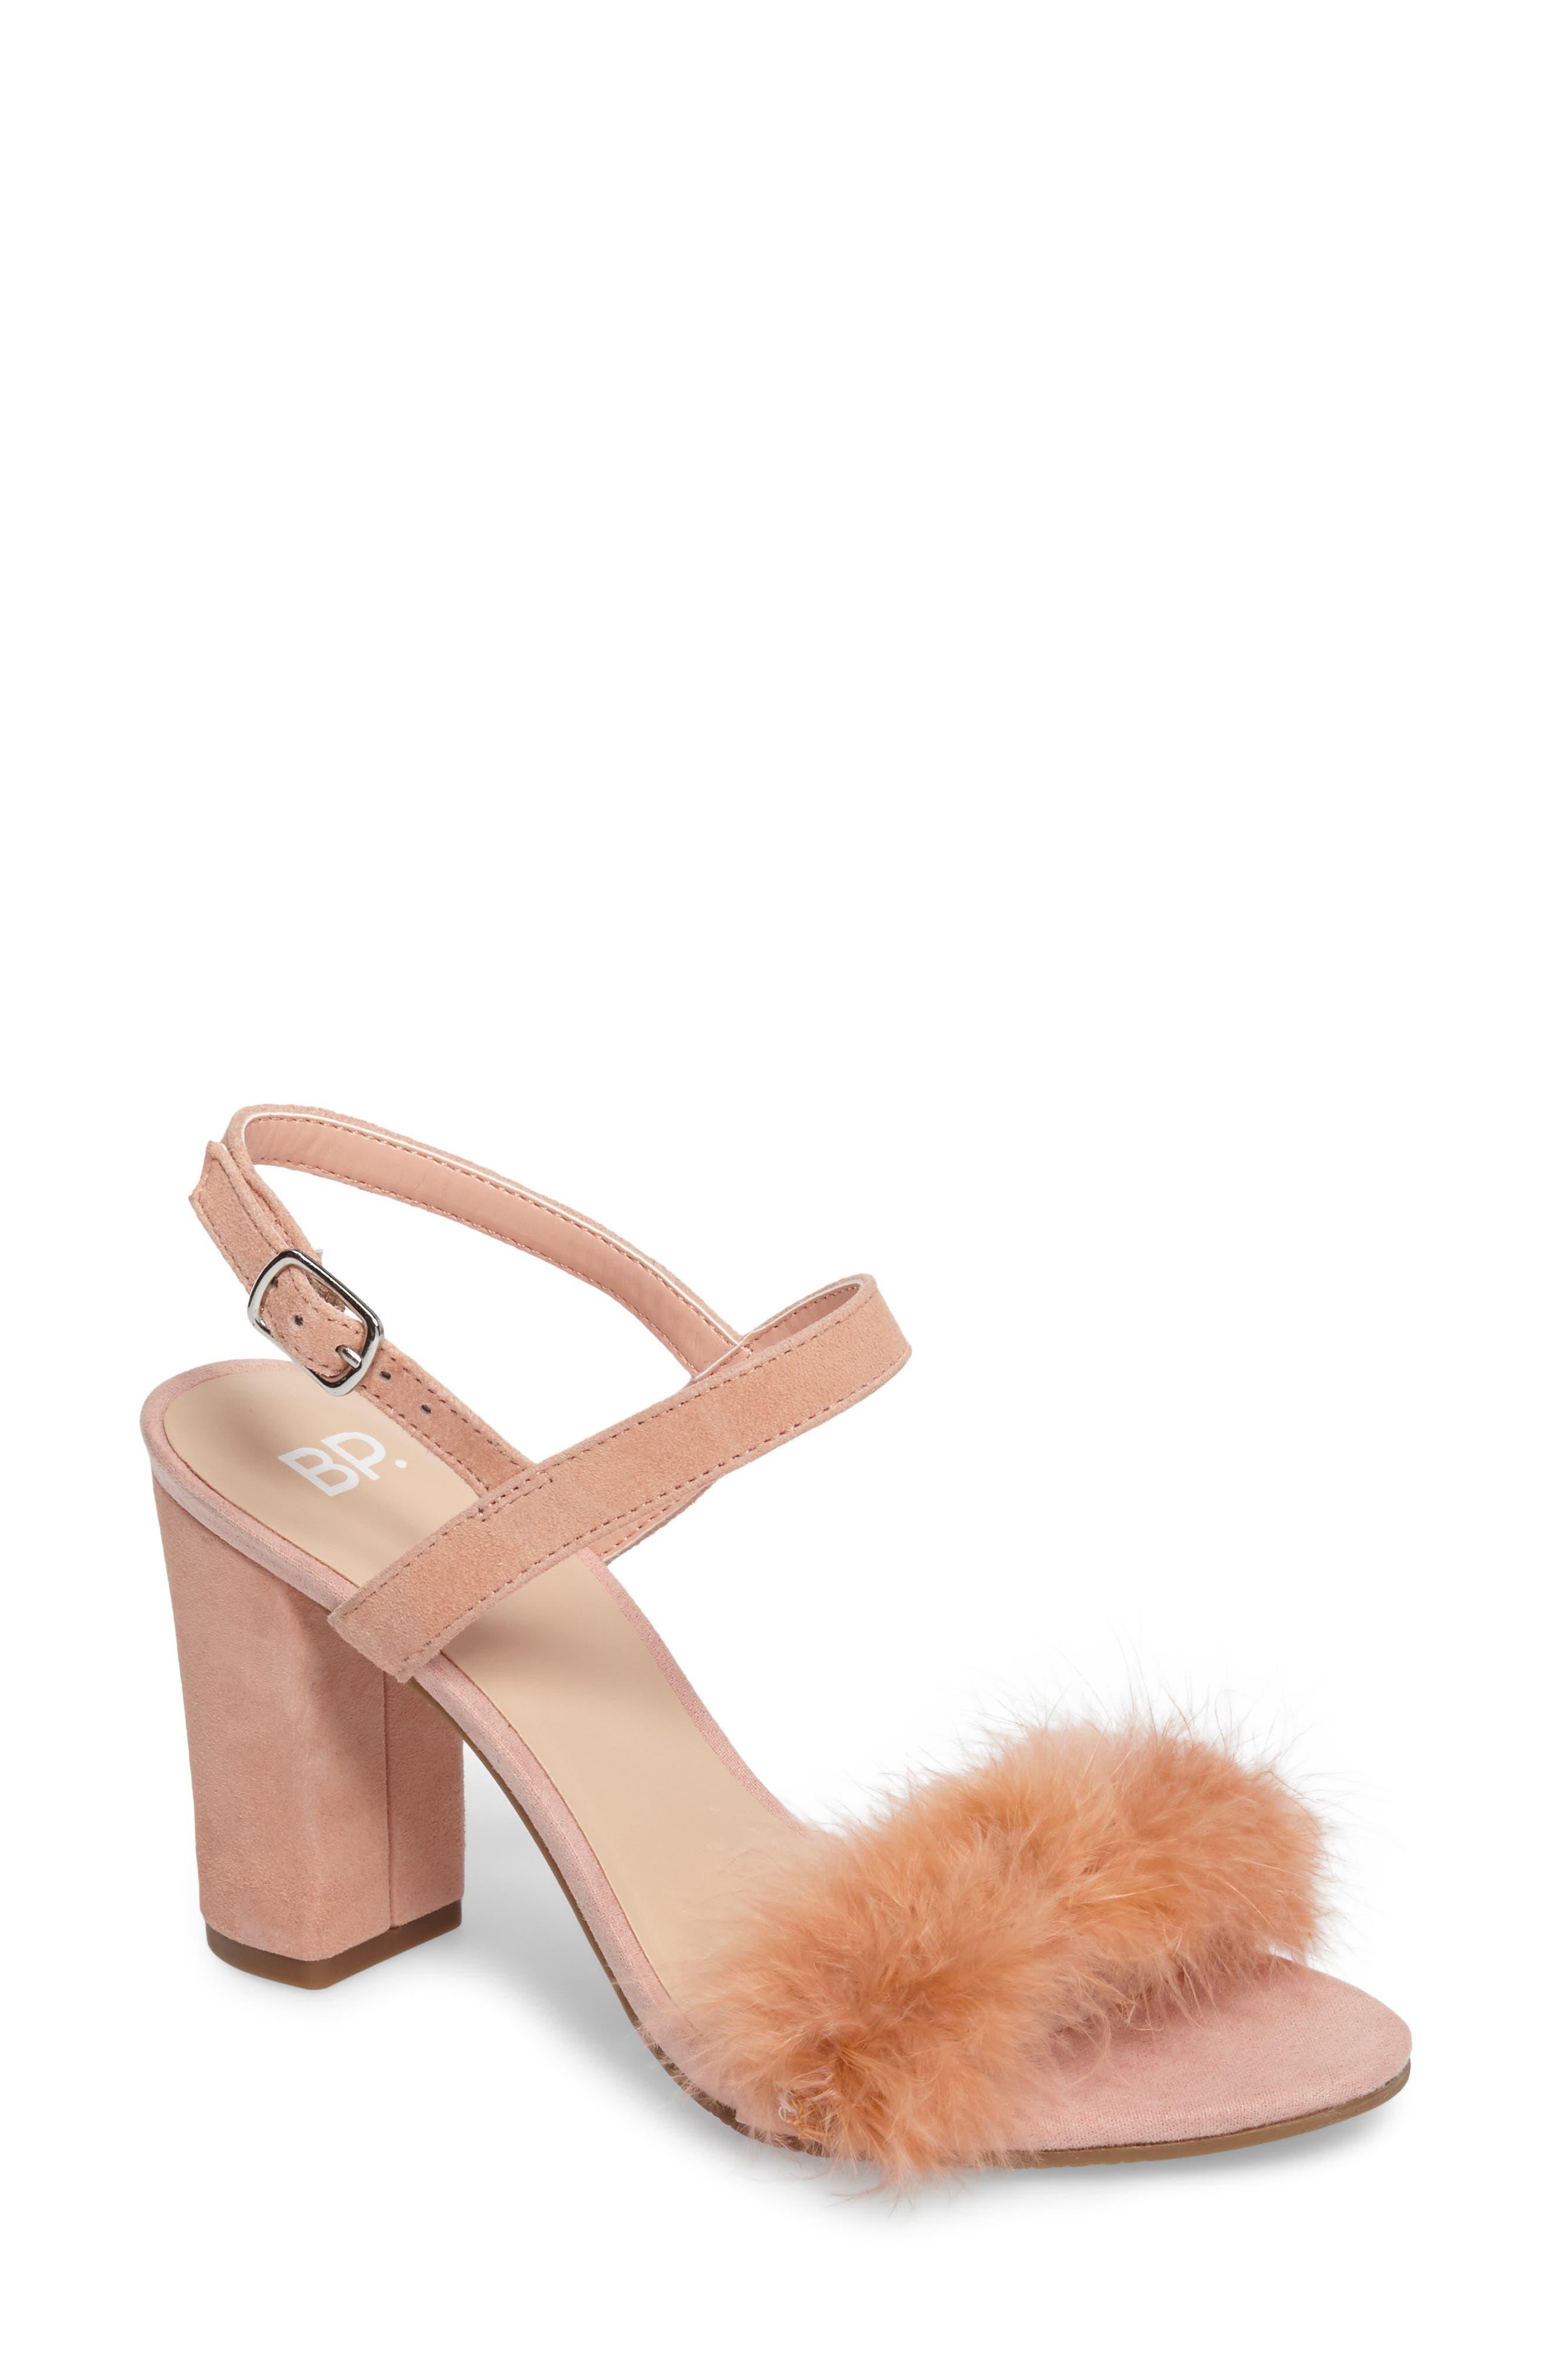 Lula Block Heel Slingback Sandal,                             Main thumbnail 1, color,                             Blush Feathers